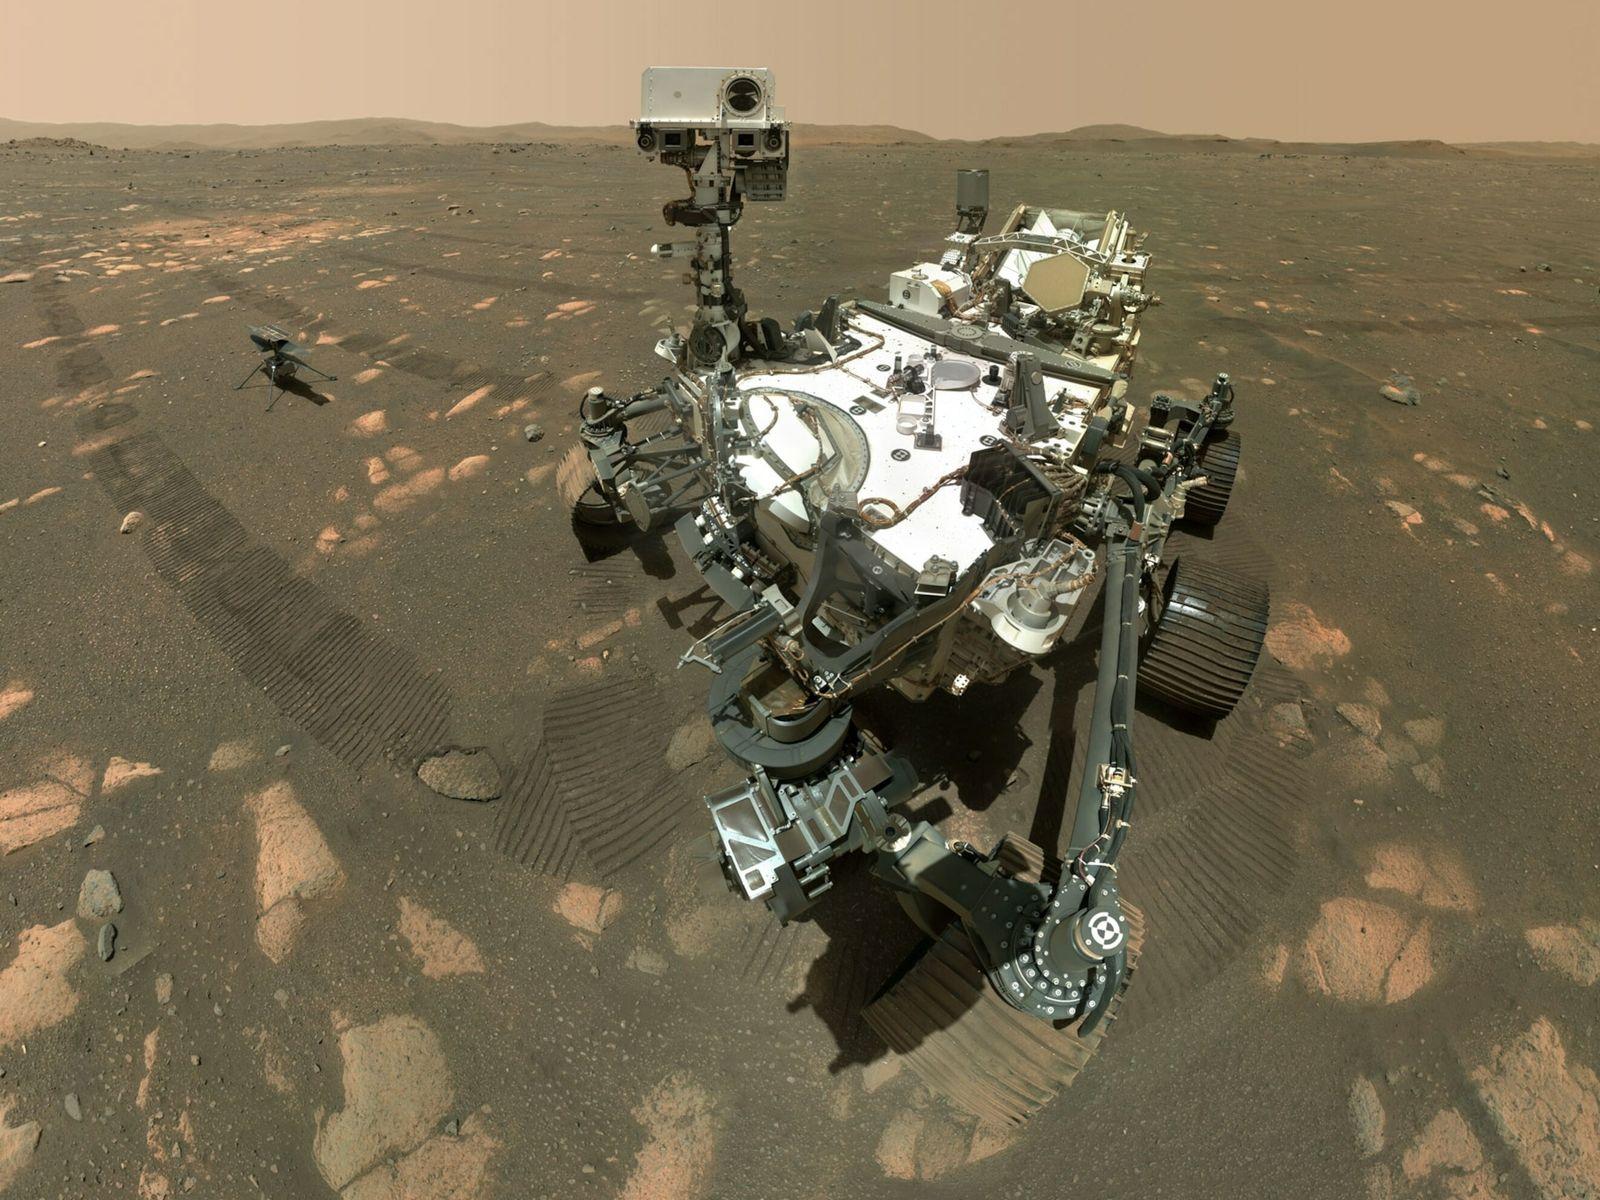 O rover Perseverance da NASA recolheu a sua primeira amostra de rocha para enviar para a ...